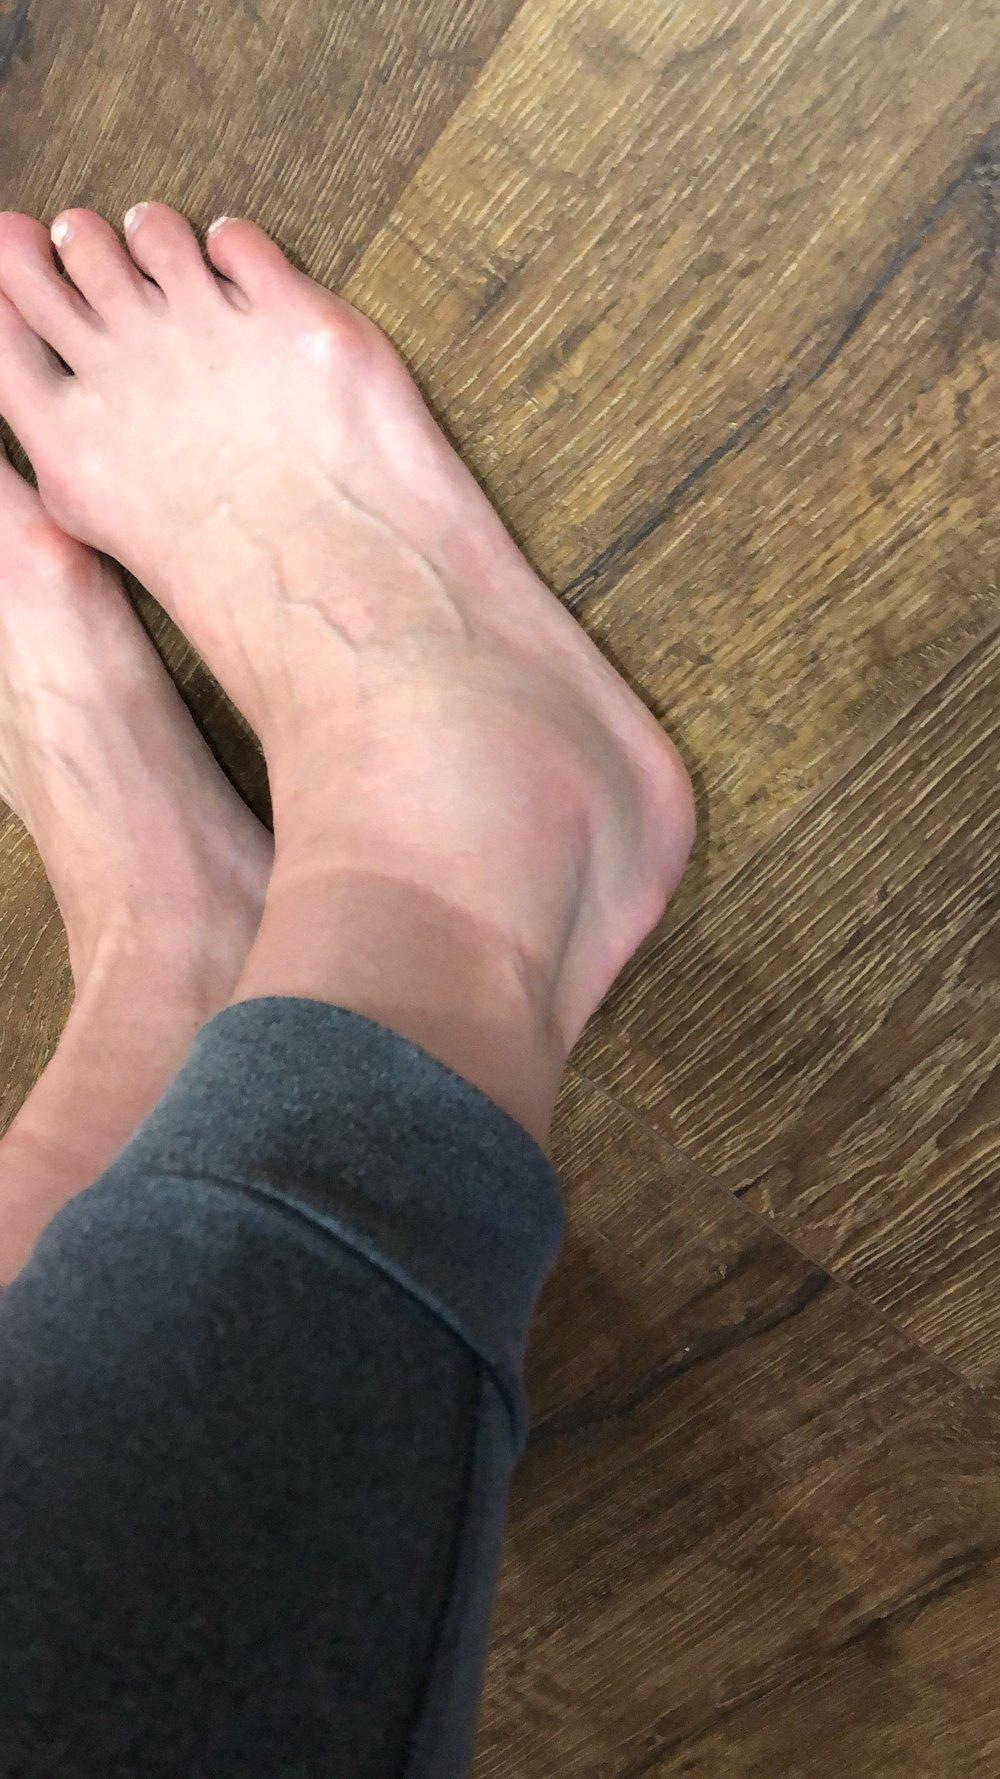 Day 2 ankle twist